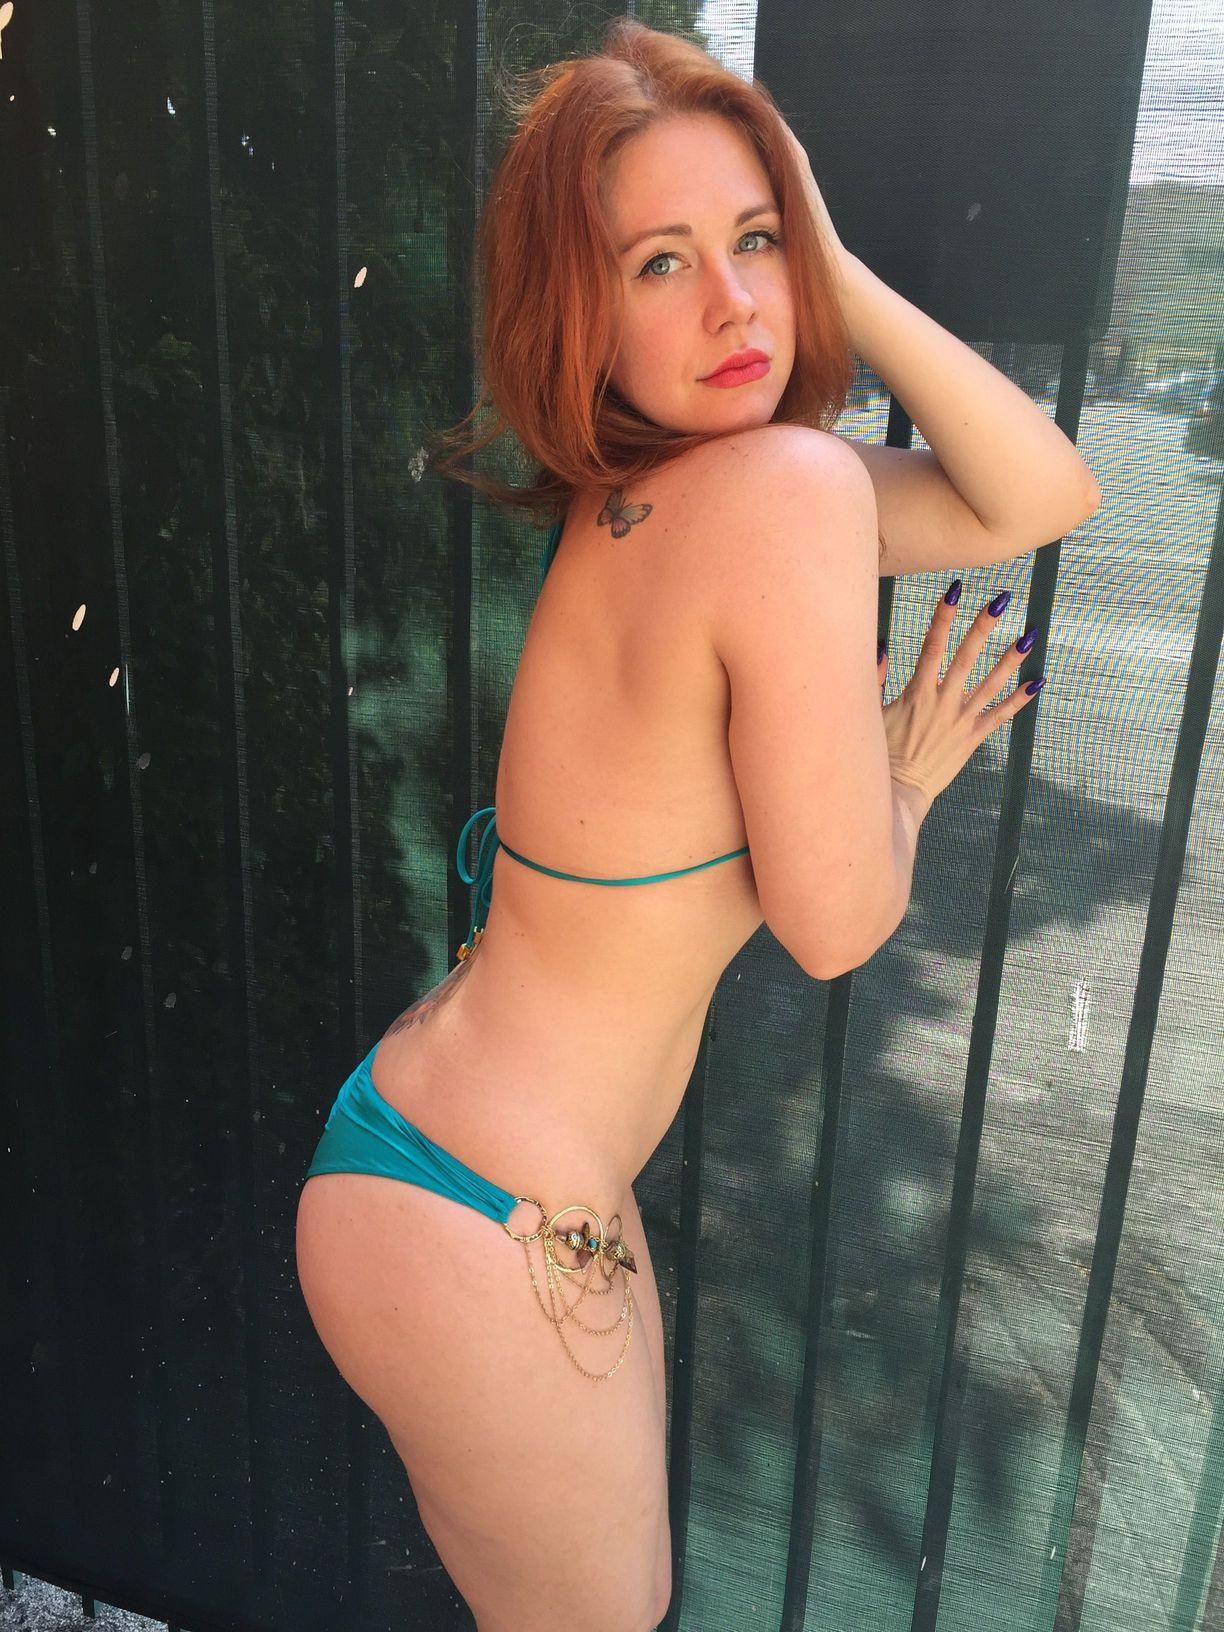 Maitland Ward in Bikini 1 TheFappening.nu